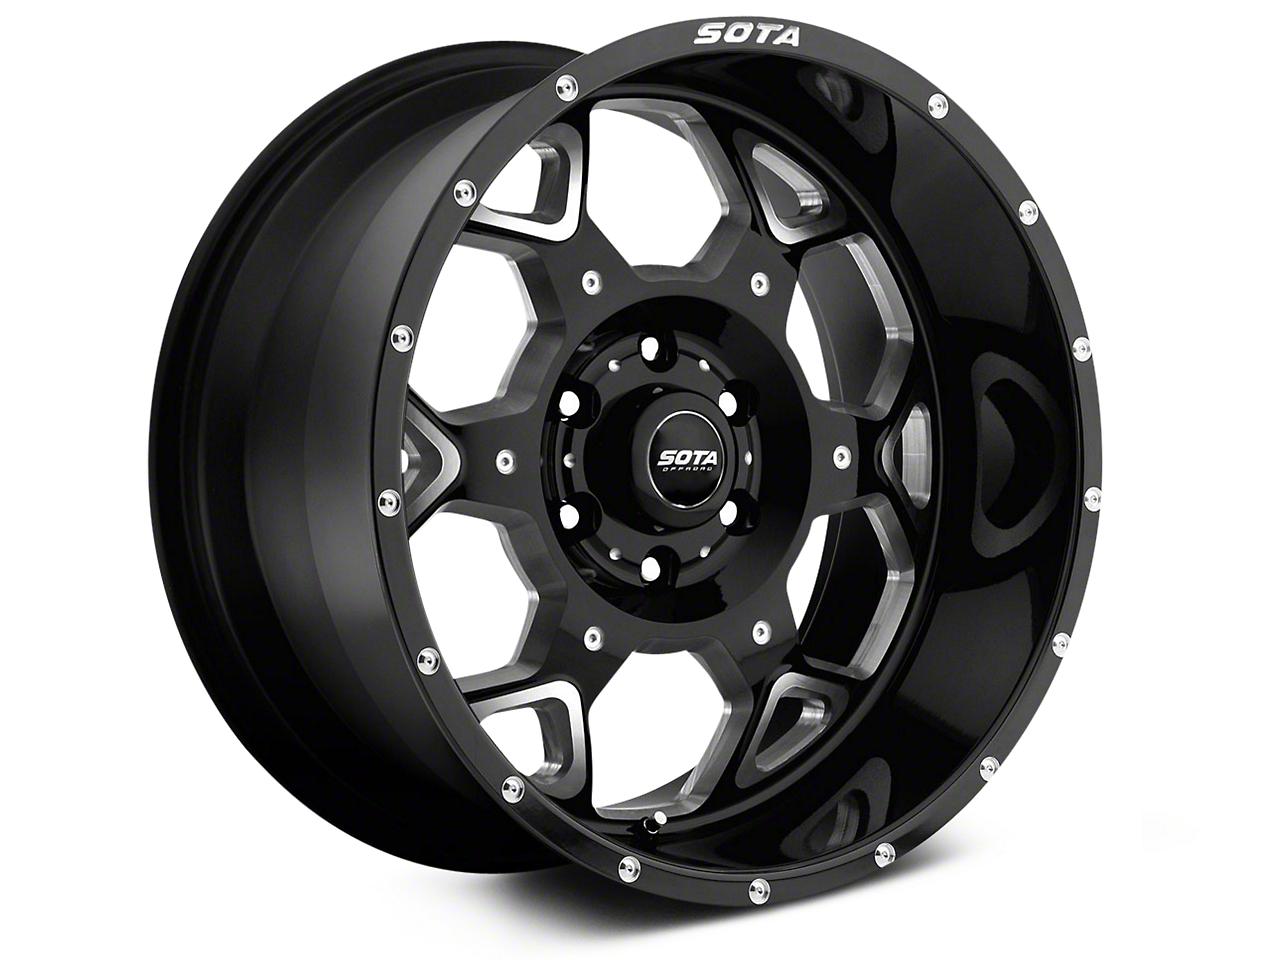 SOTA Off Road SKUL Death Metal 6-Lug Wheel - 20x10 (07-18 Sierra 1500)